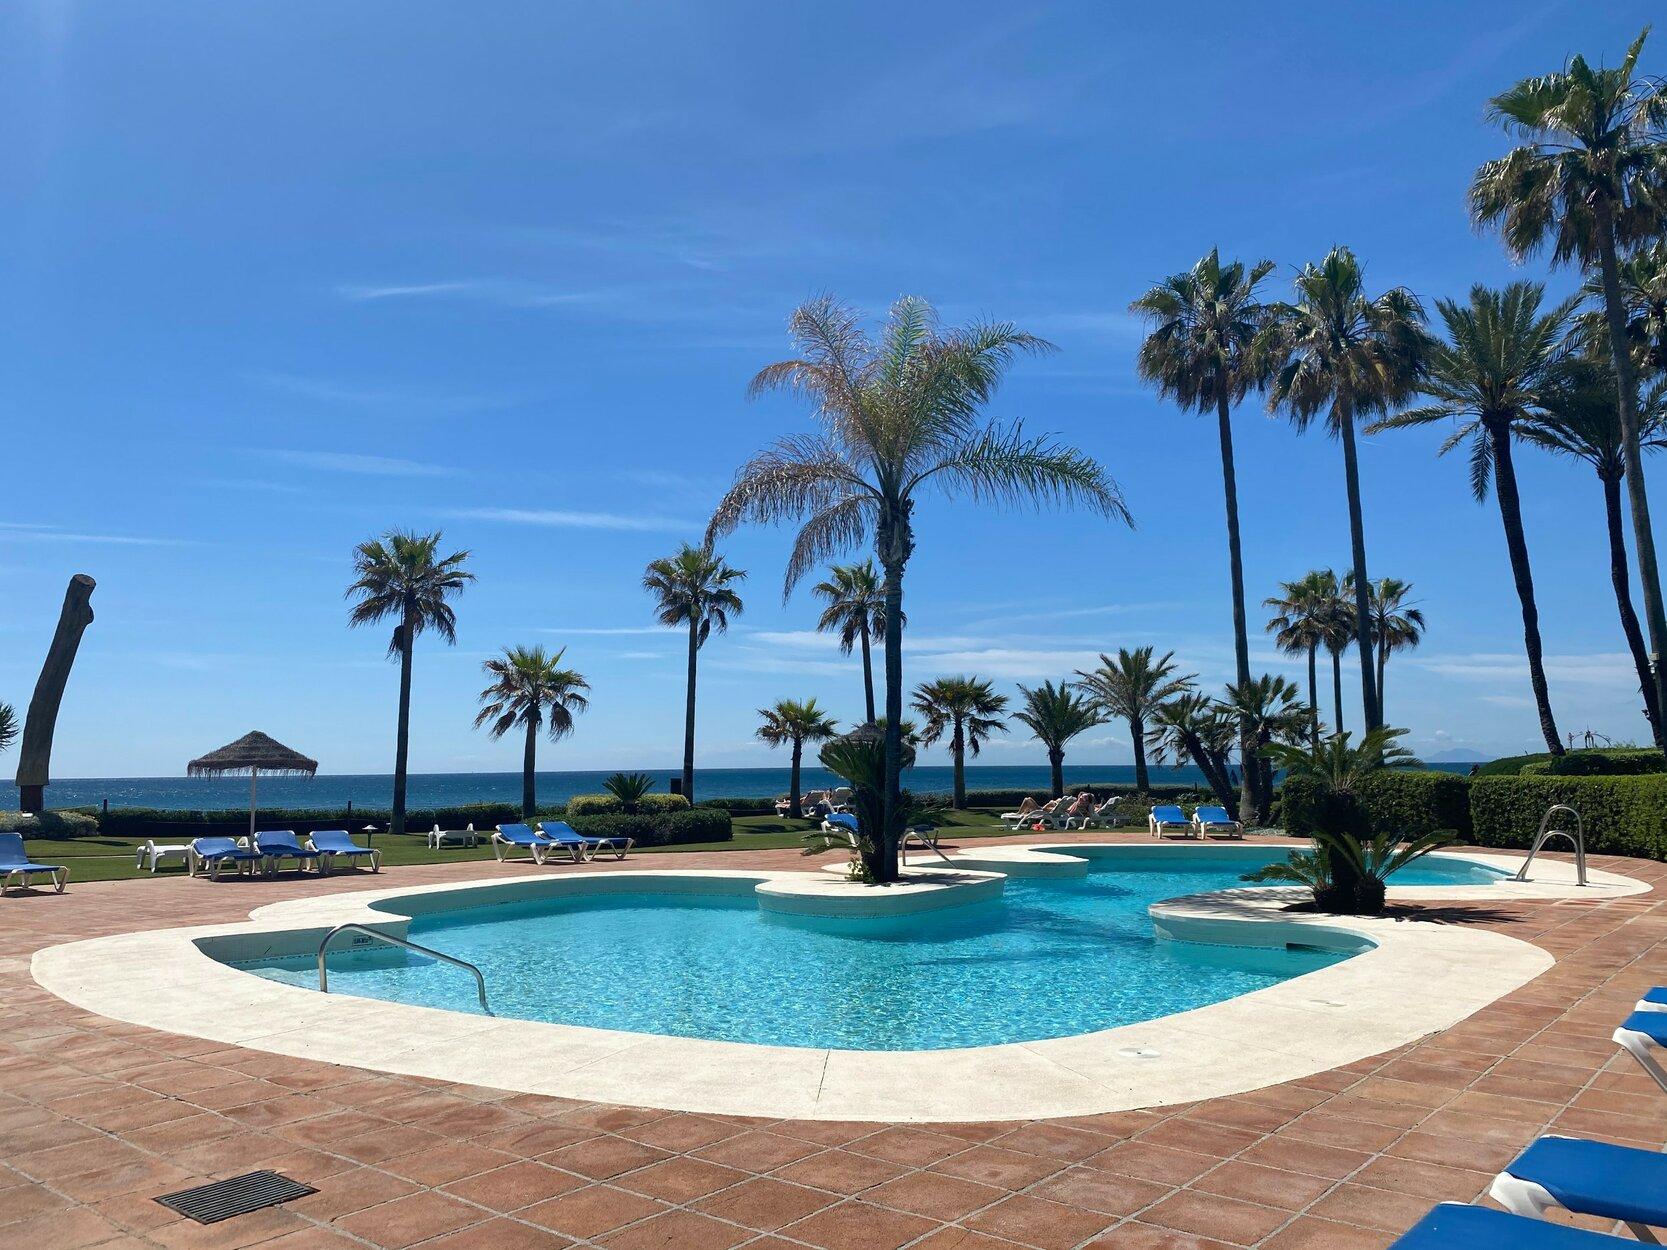 Apartment for sale in Estepona, Alcazaba Beach